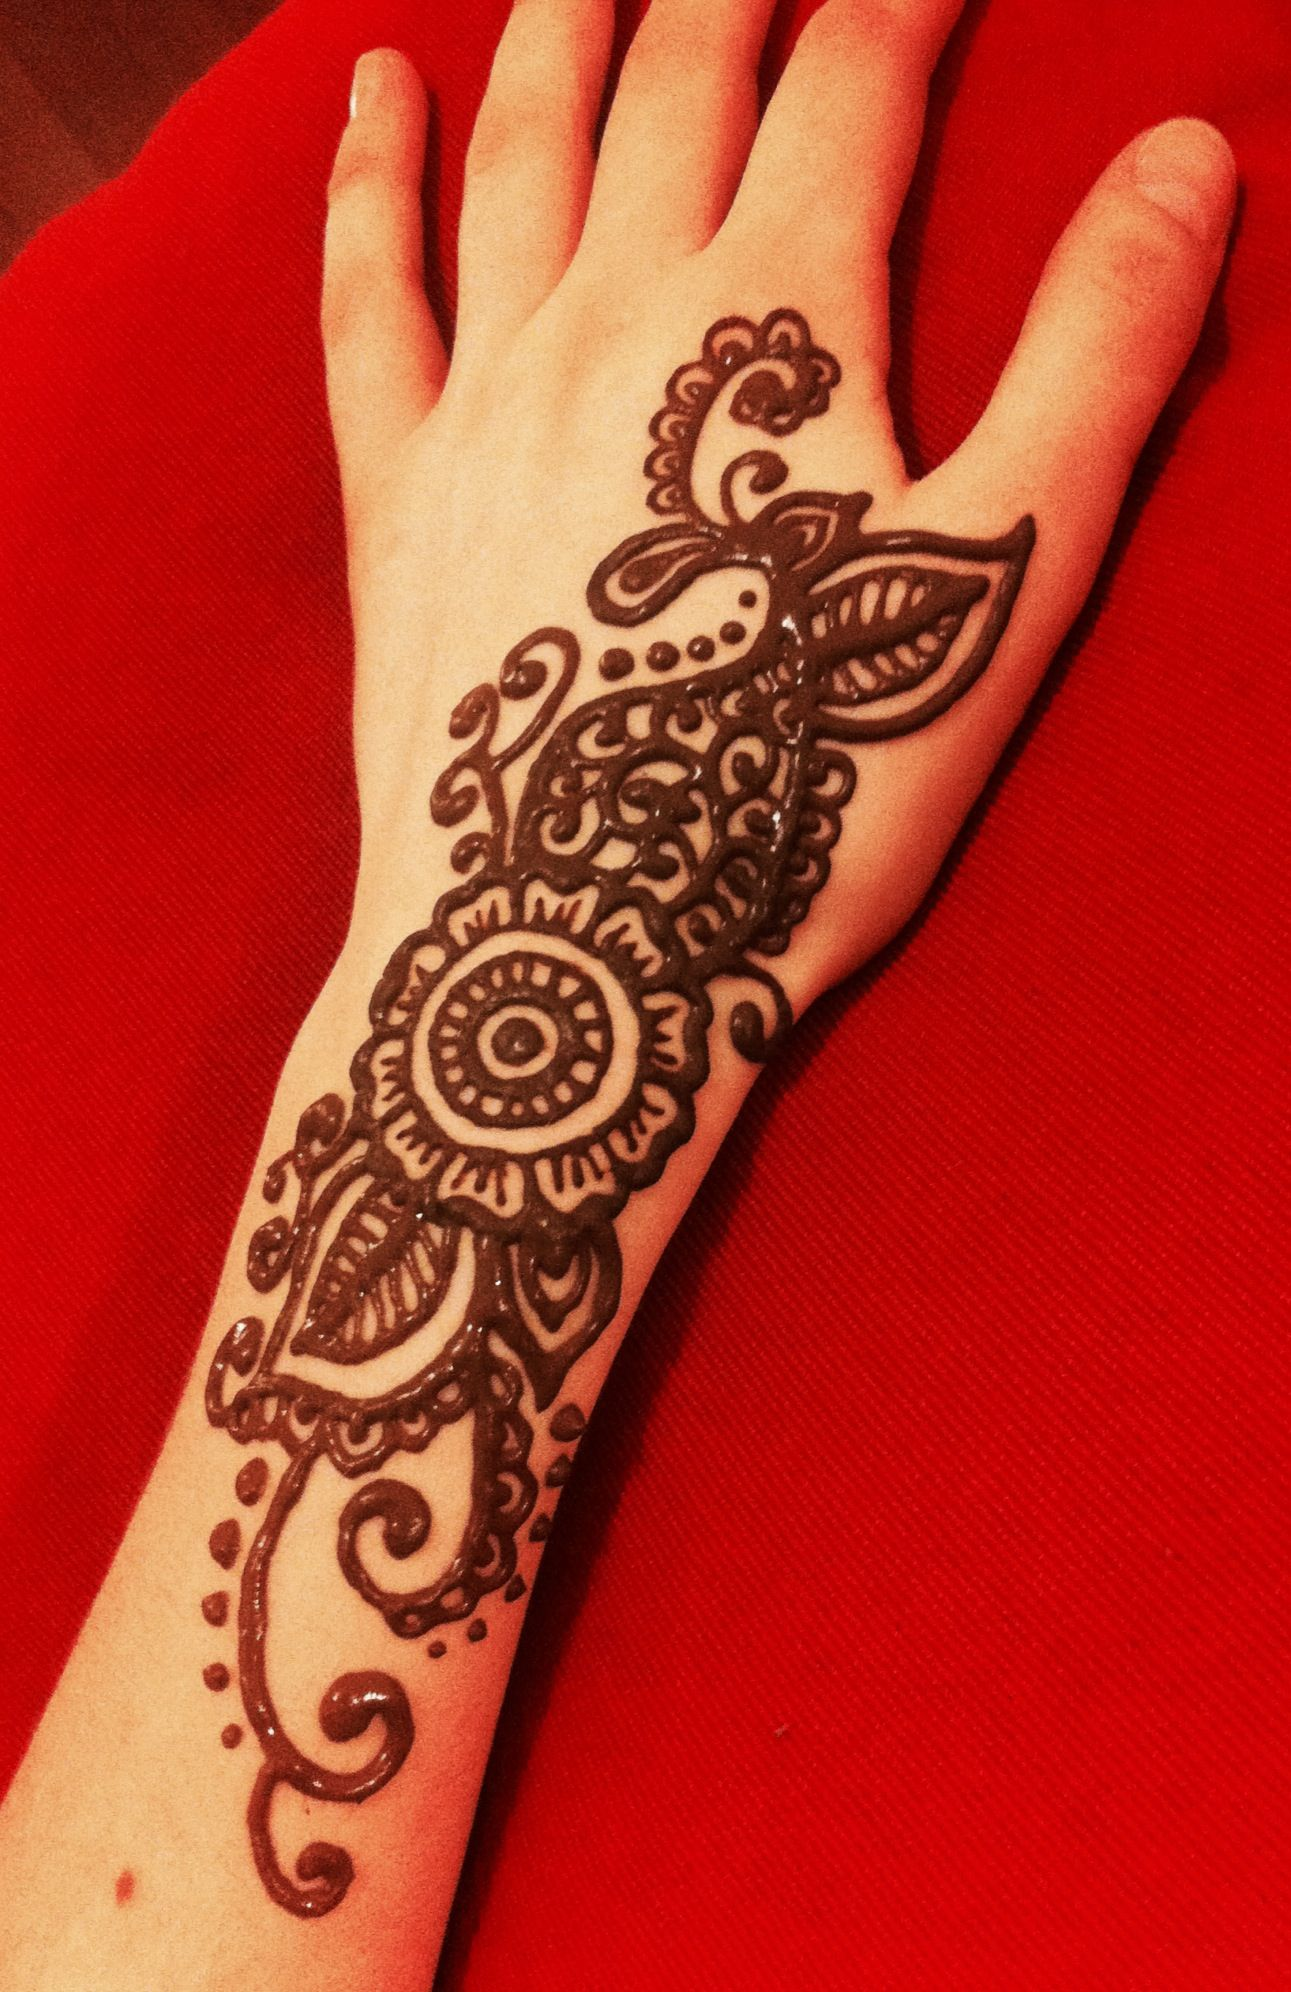 Mehndi Patterns For Arms : Flower swirly henna on my arm designs pinterest